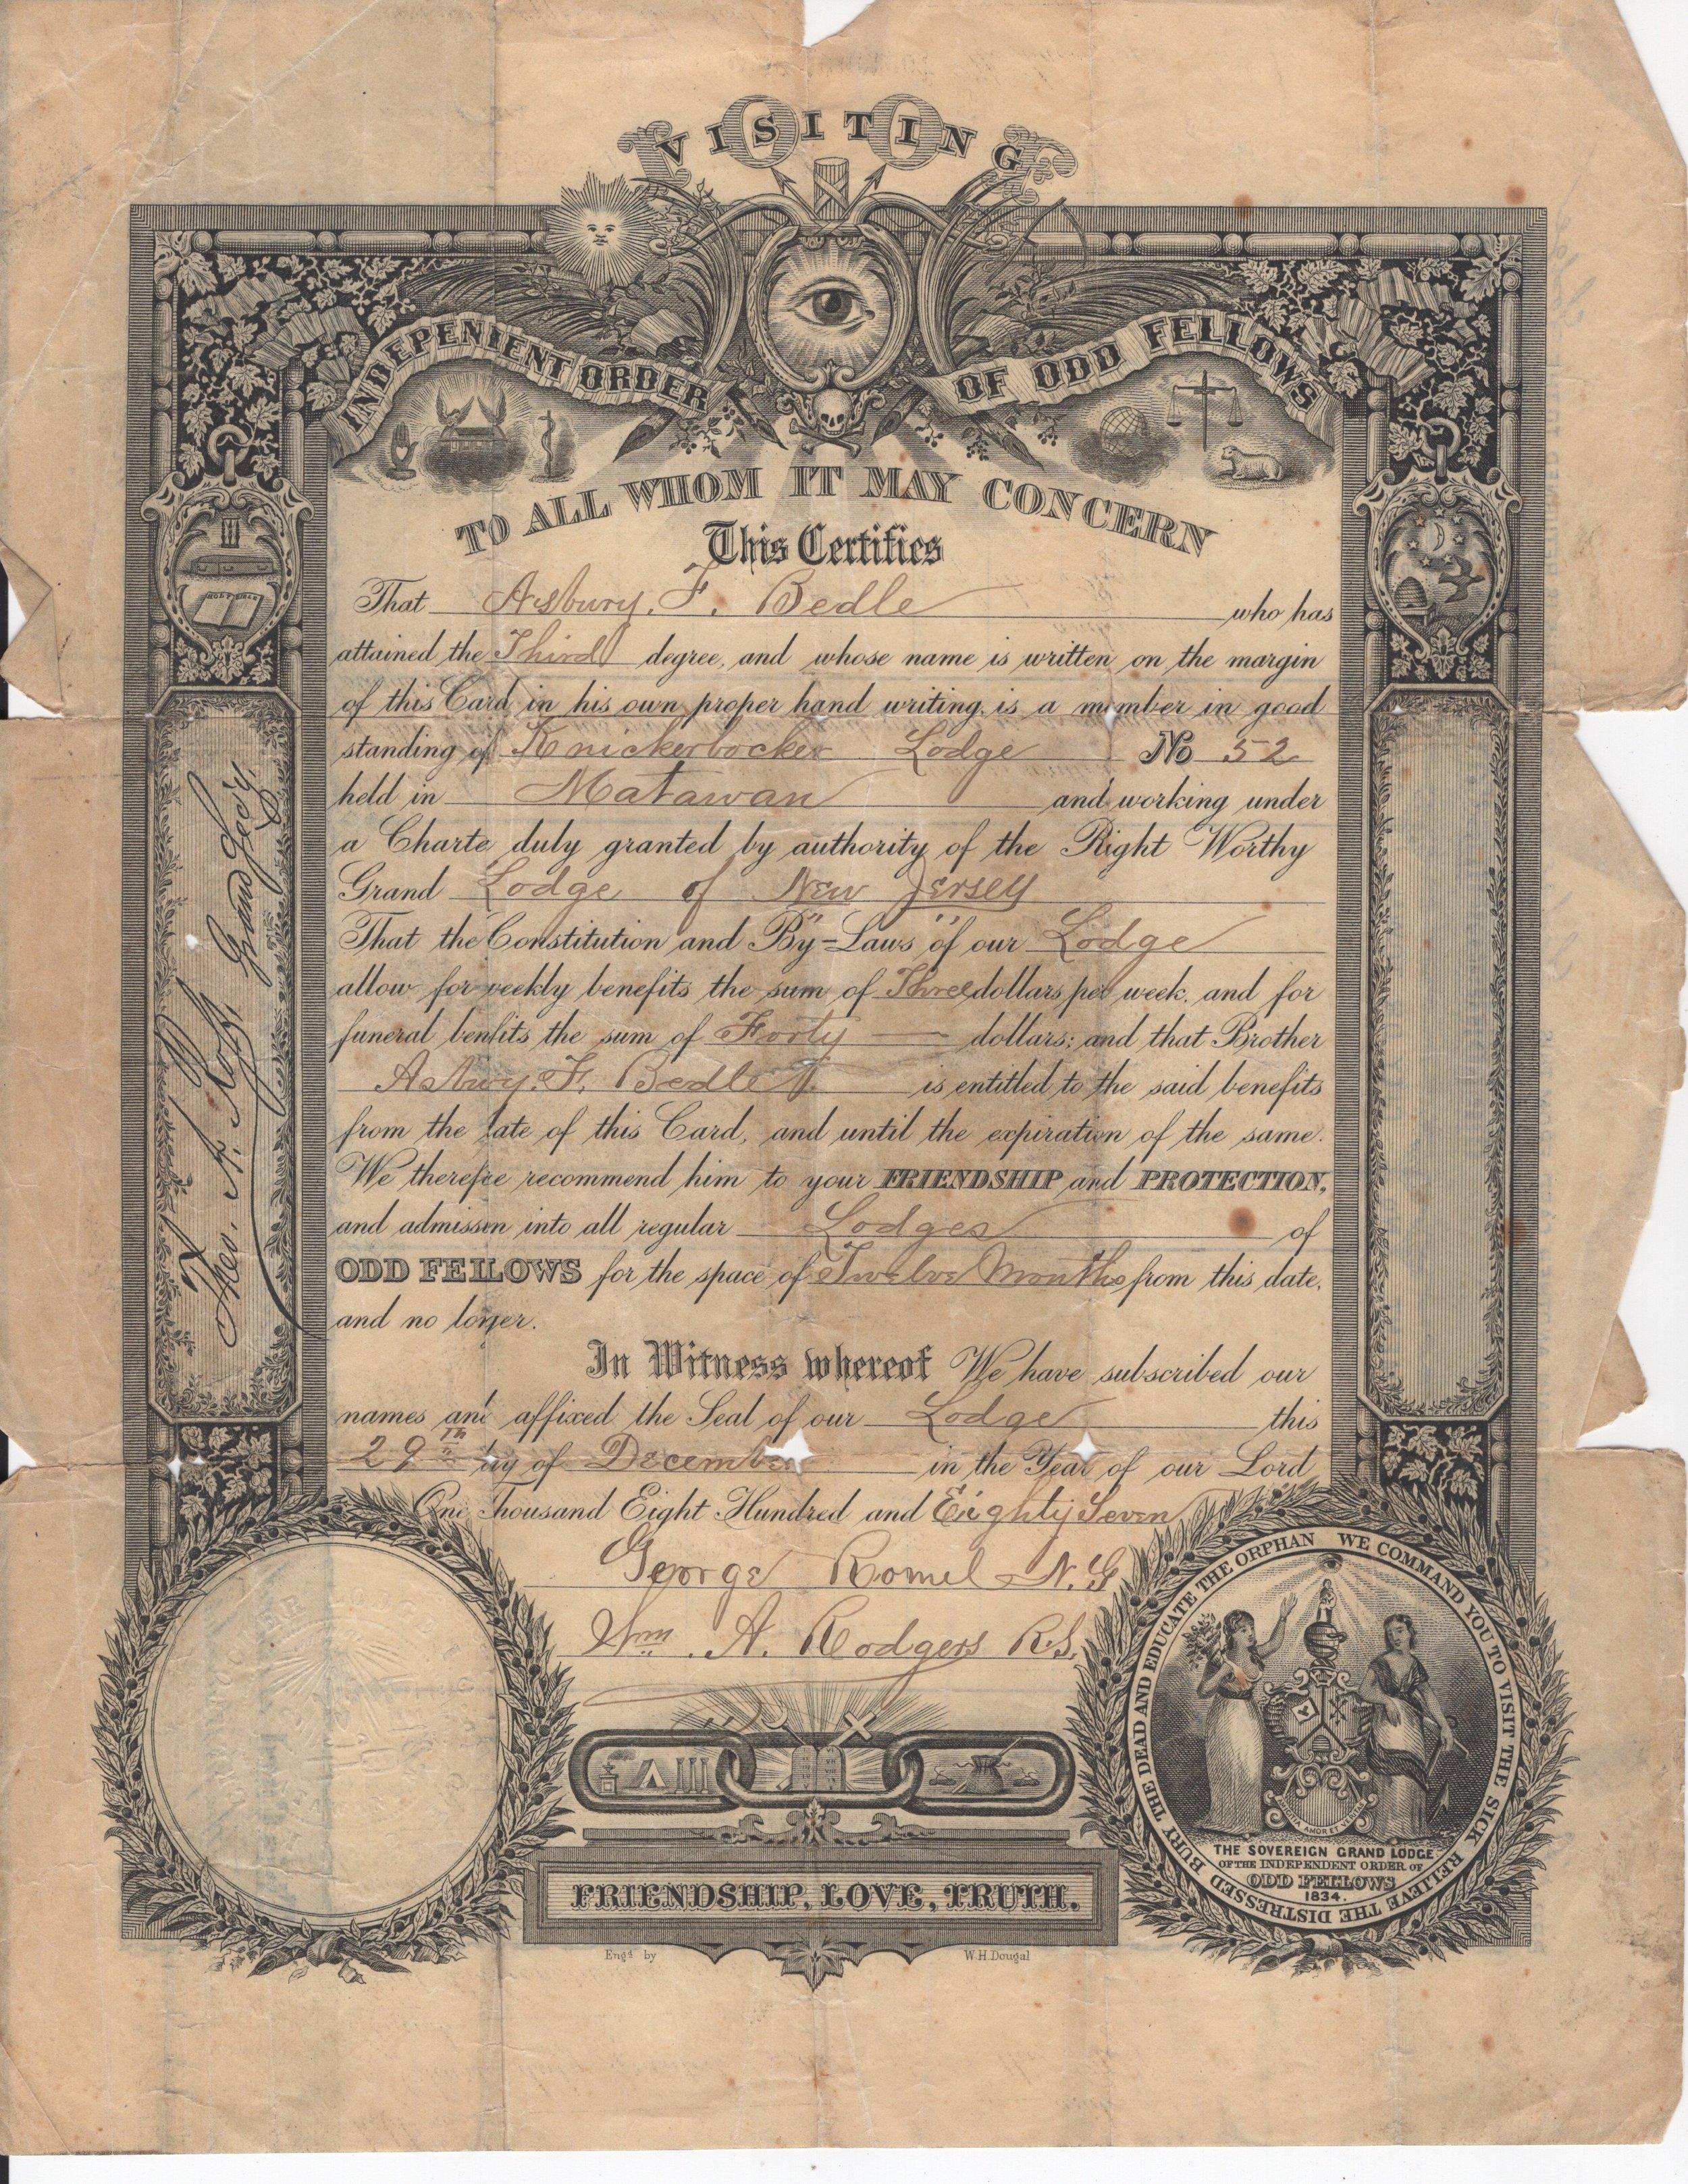 Asbury F. Bedle  Fellowship Certificate